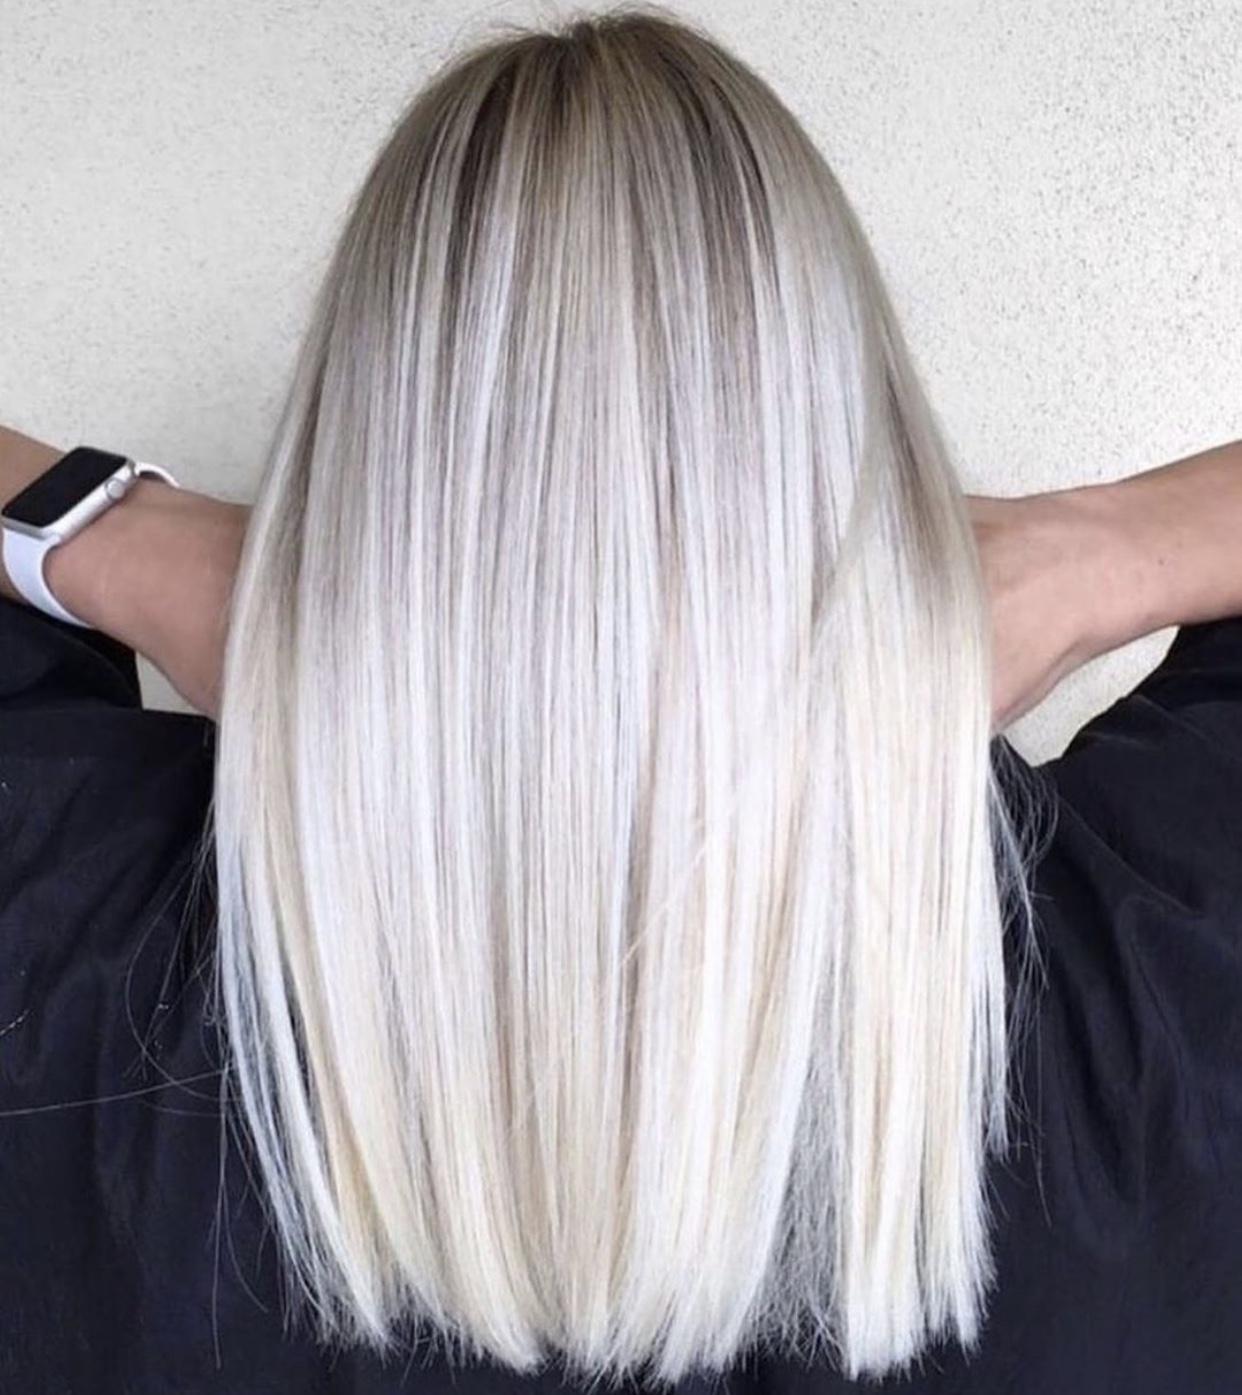 eden_vero_beach_hair_salon_01.jpg